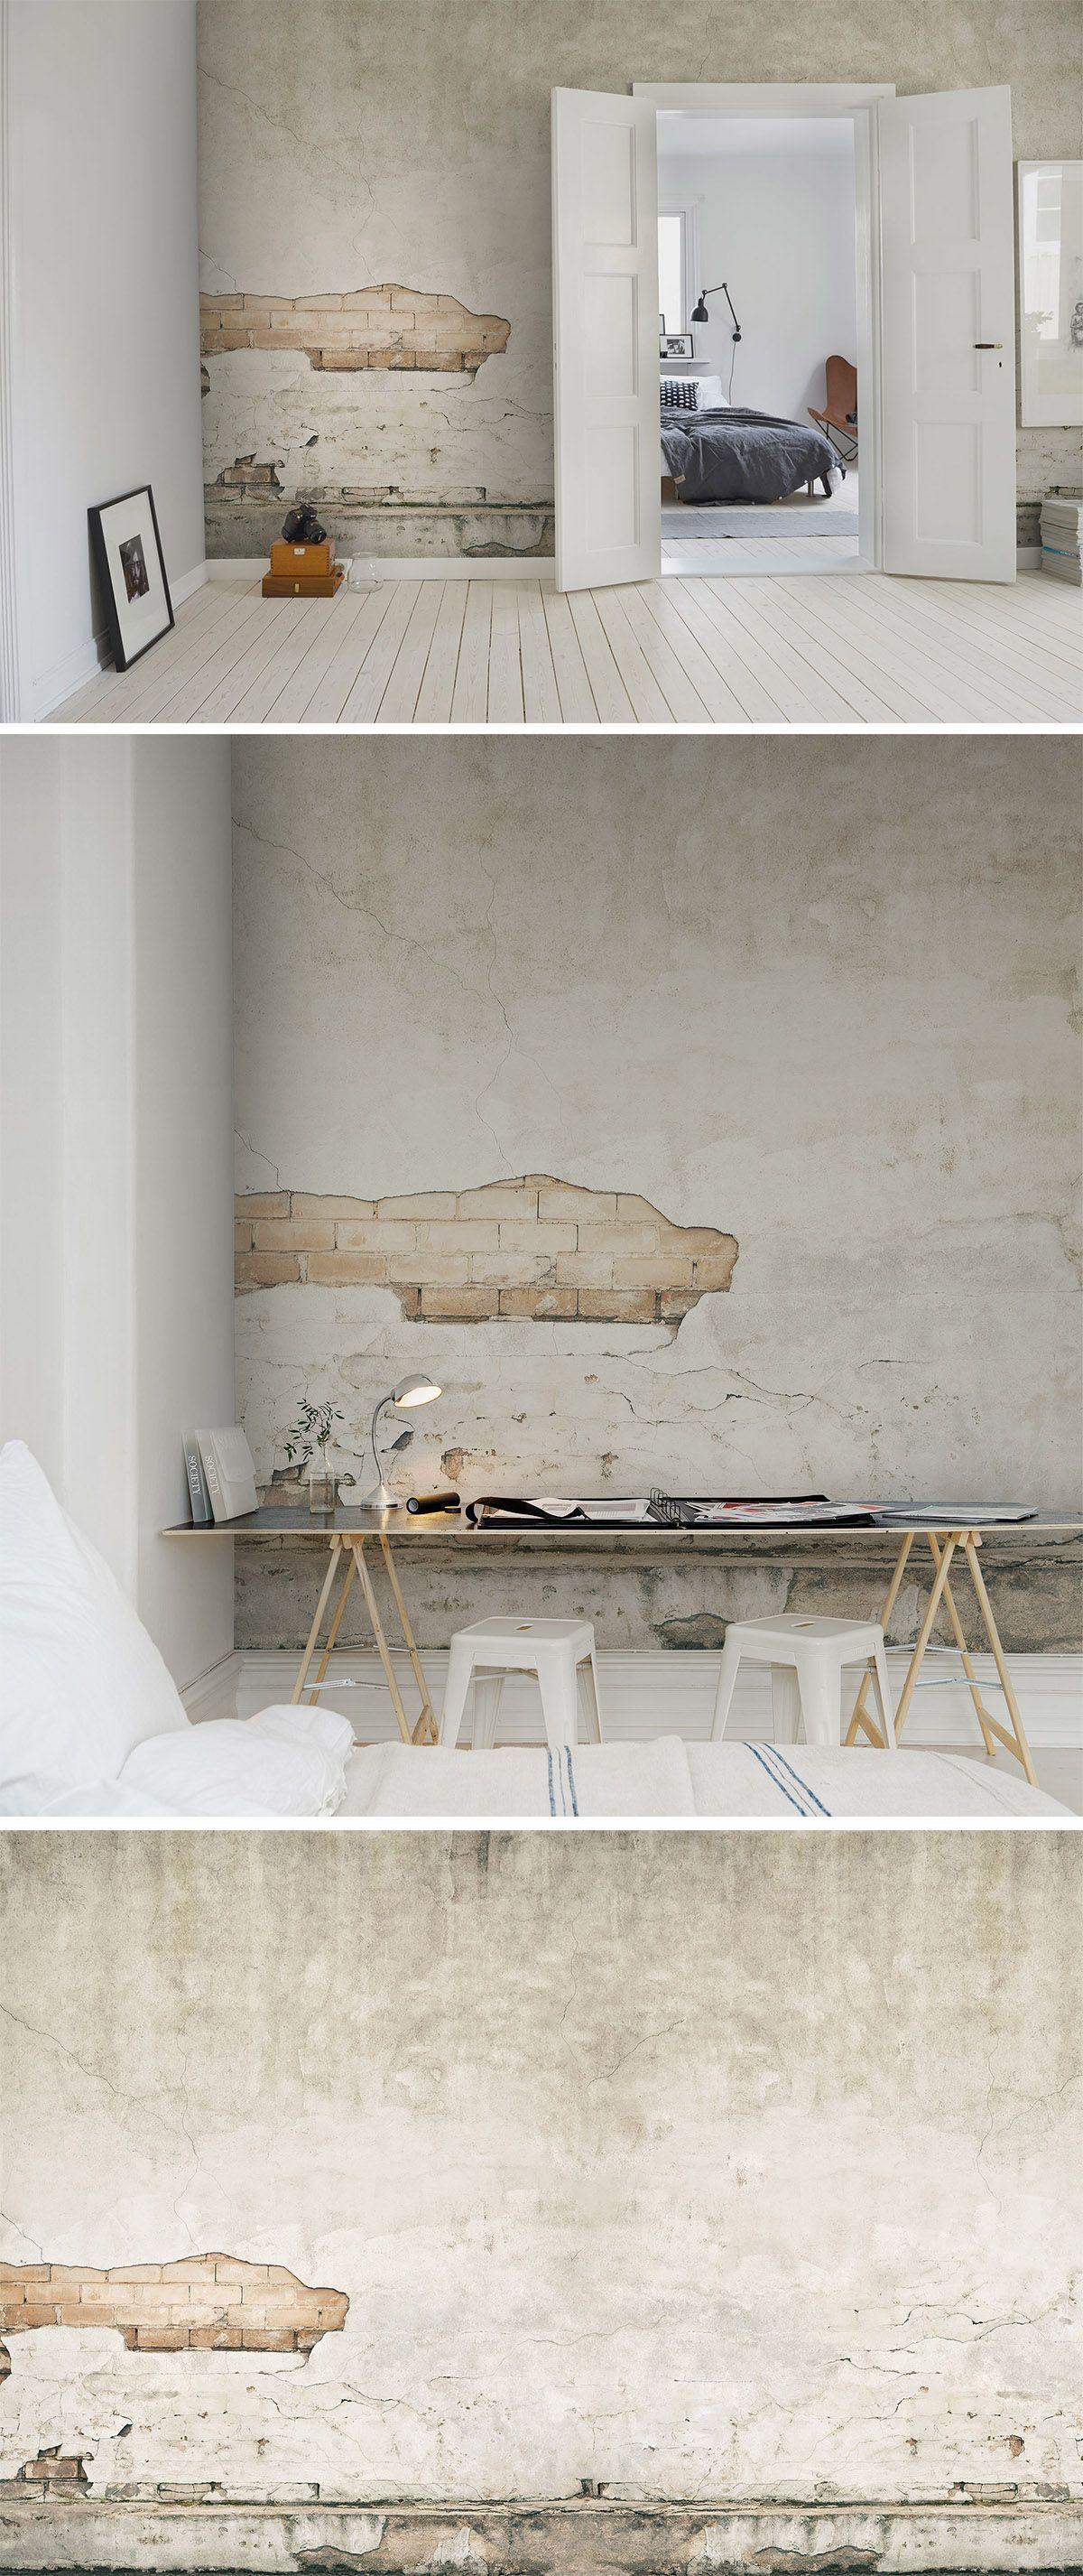 Frontage Wallpaper Living Room Brick Wallpaper Tiles Wall Wallpaper